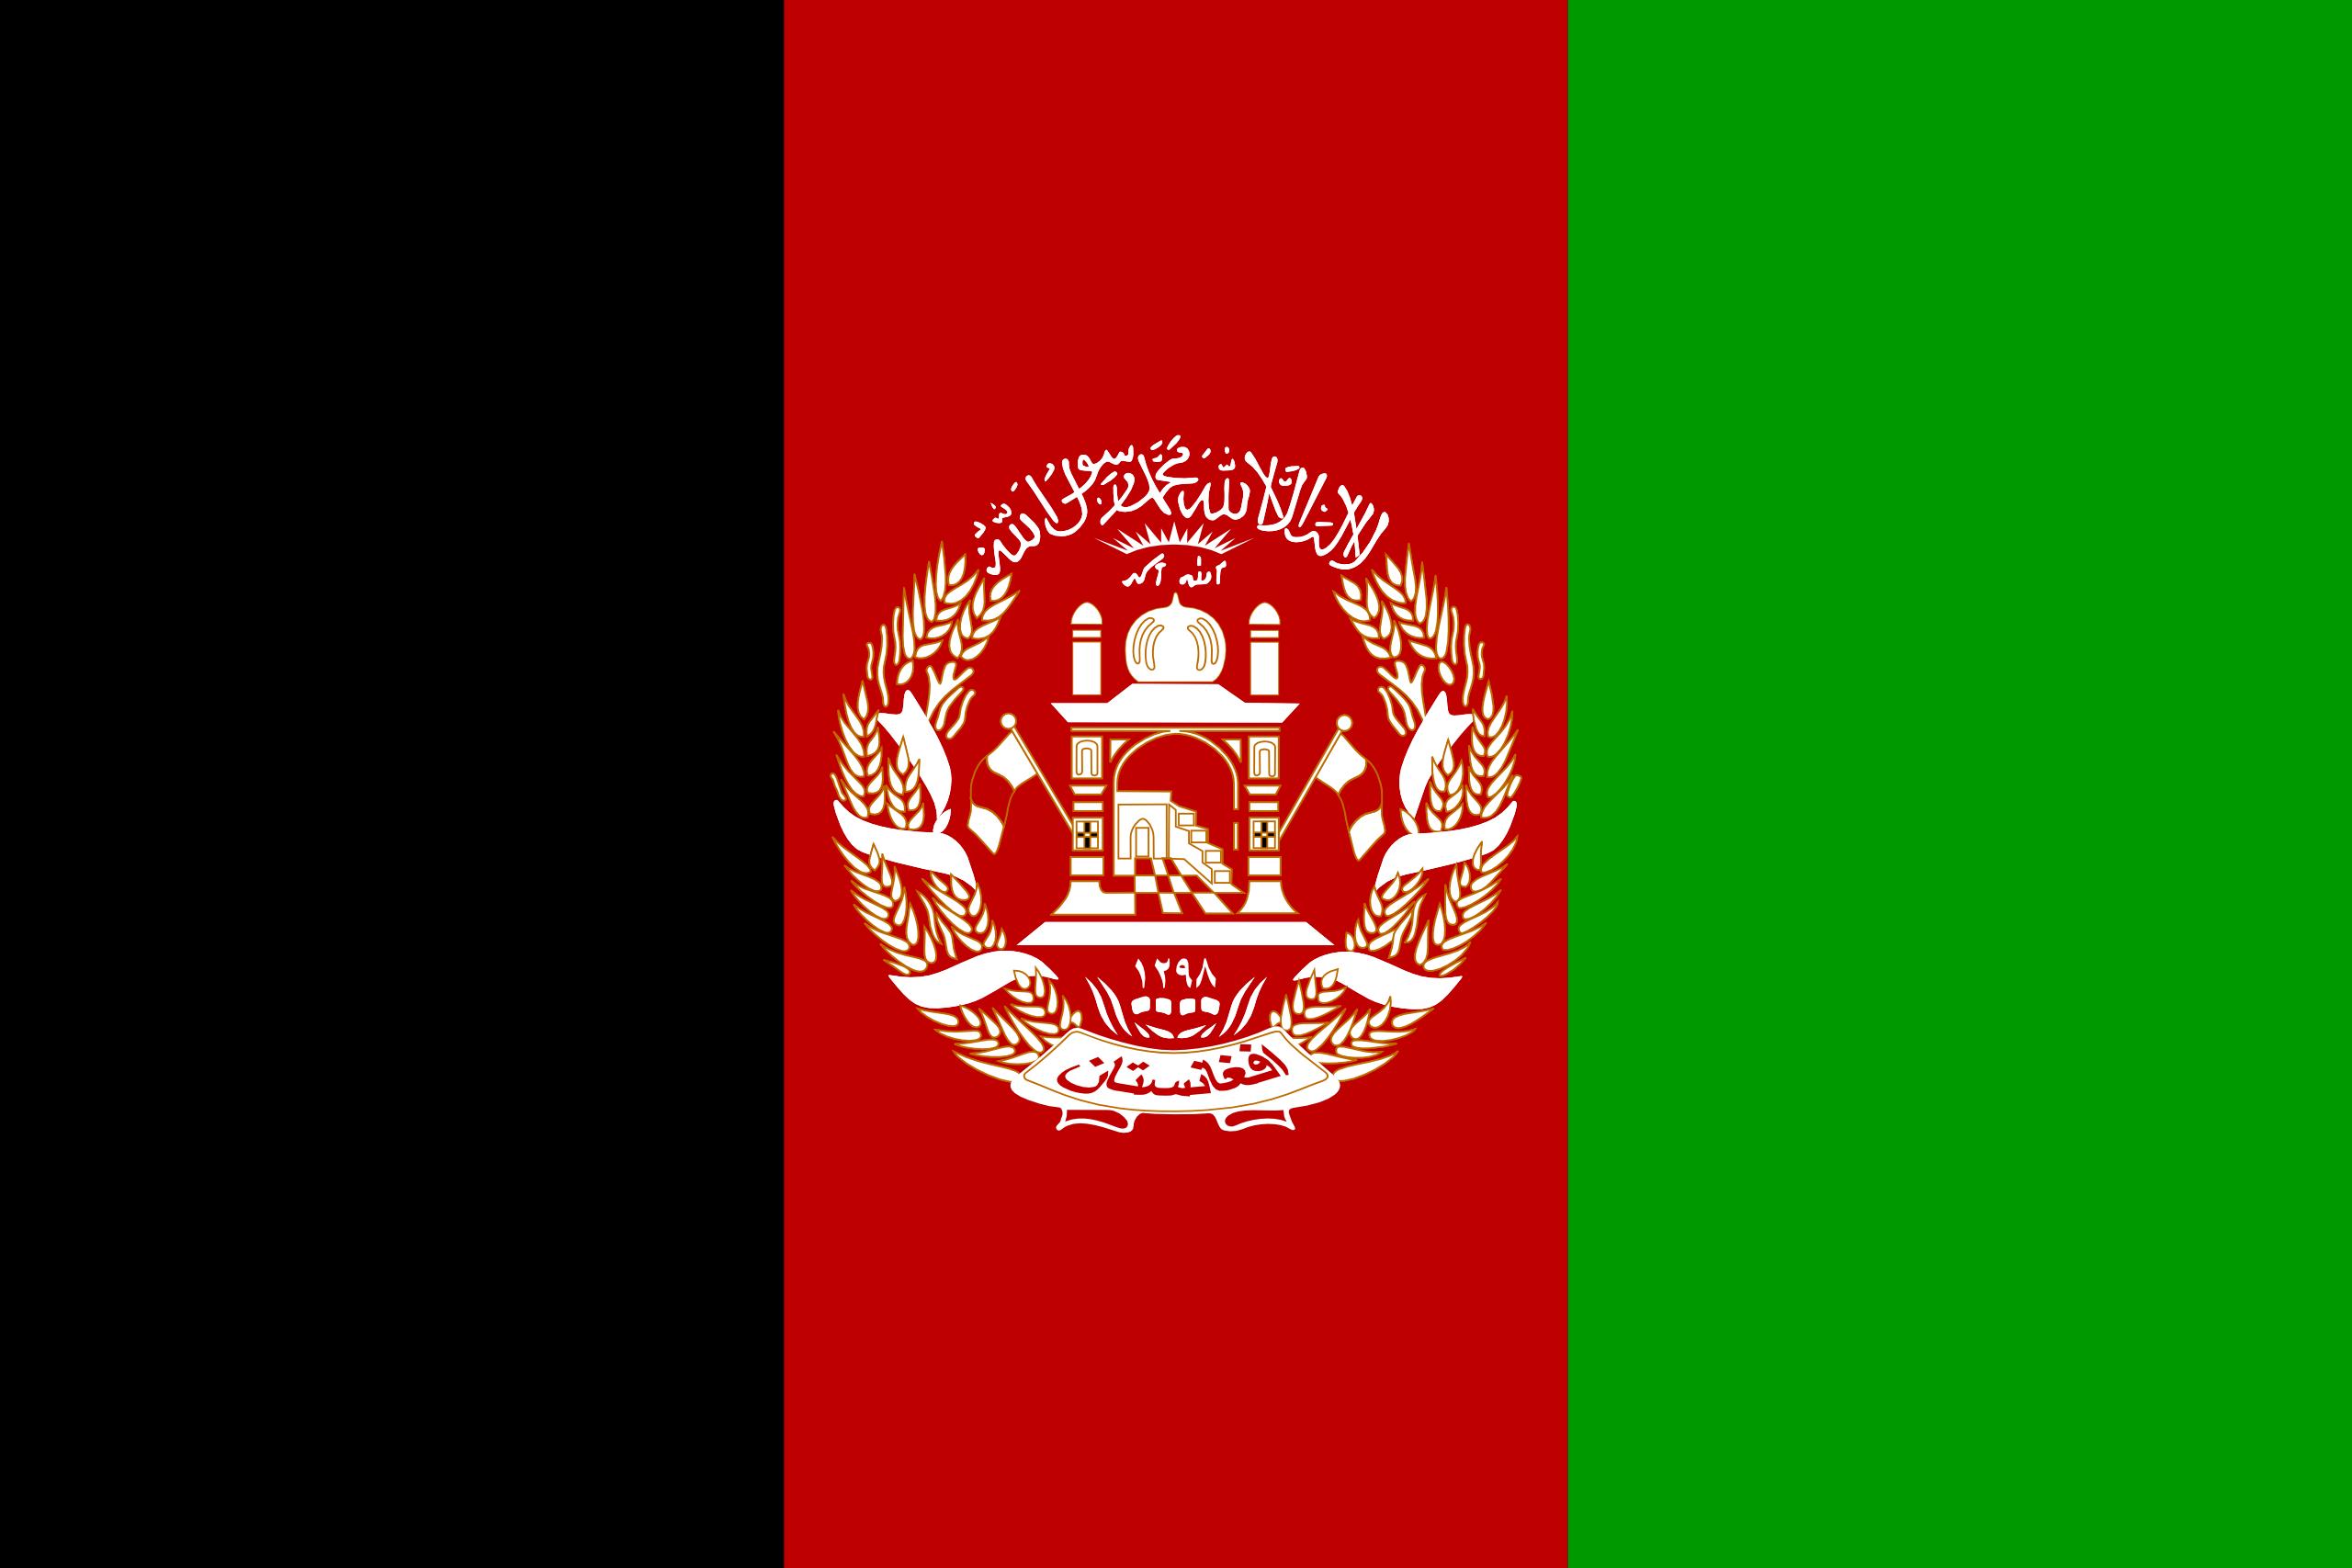 Afghanistan, Land, Emblem, Logo, Symbol - Wallpaper HD - Prof.-falken.com